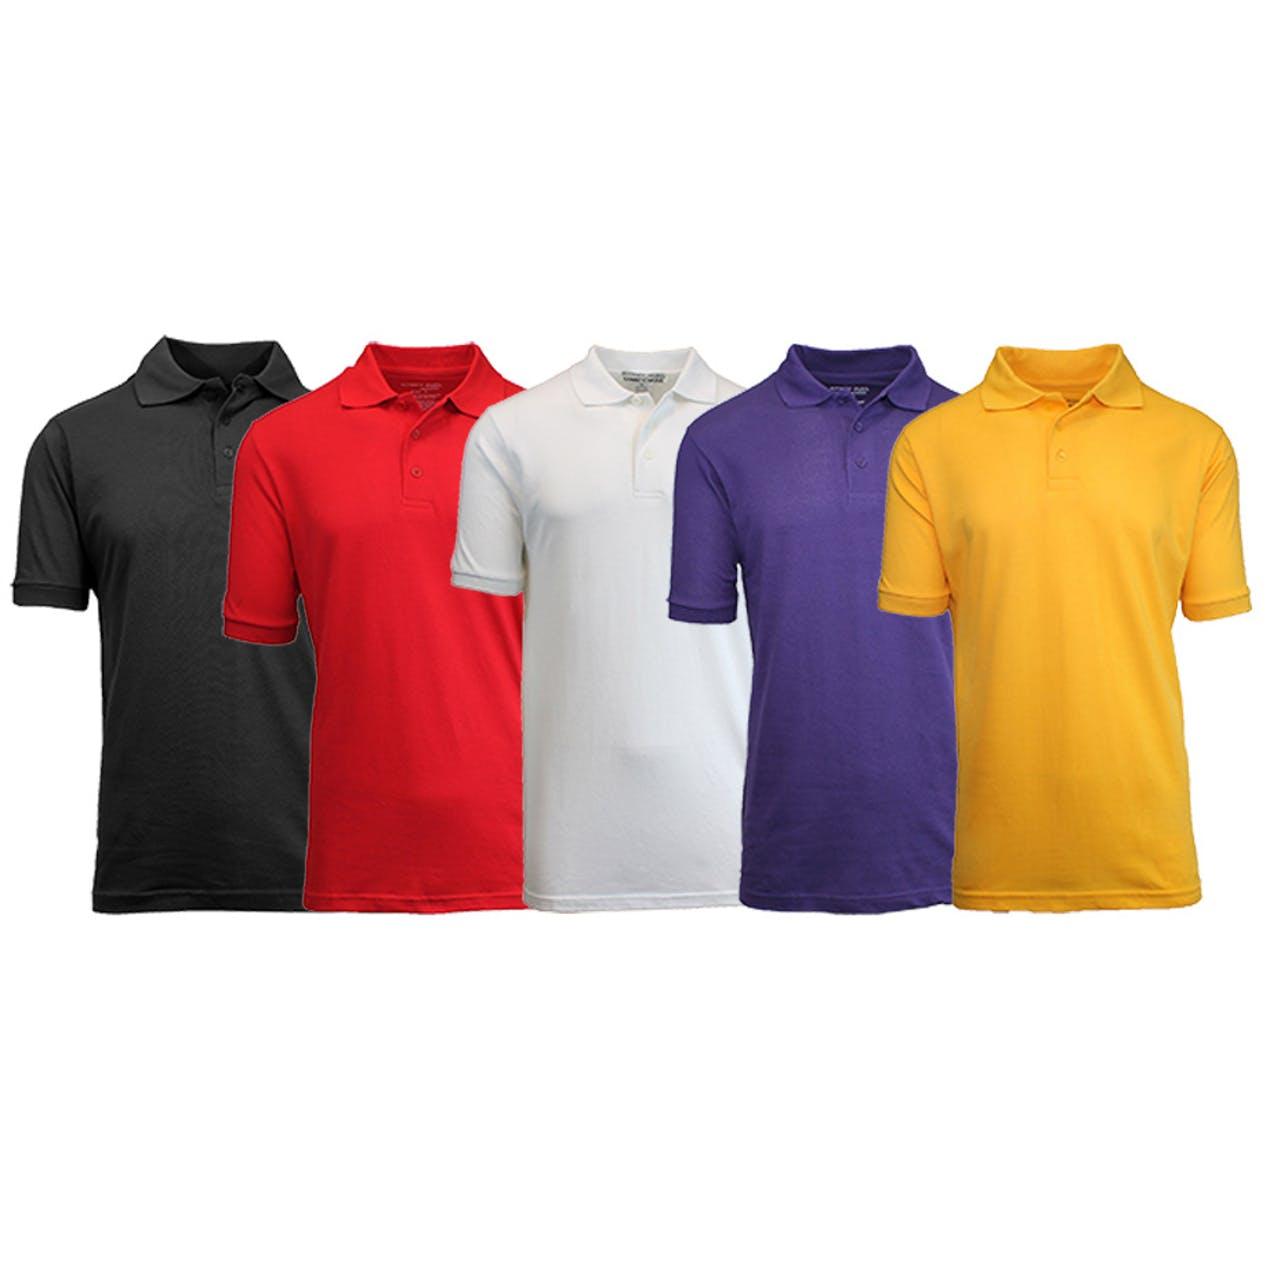 5-Pack Men's Uniform Pique Polo Shirts (S-2X) $34 Free Shipping at Tanga.com $33.99